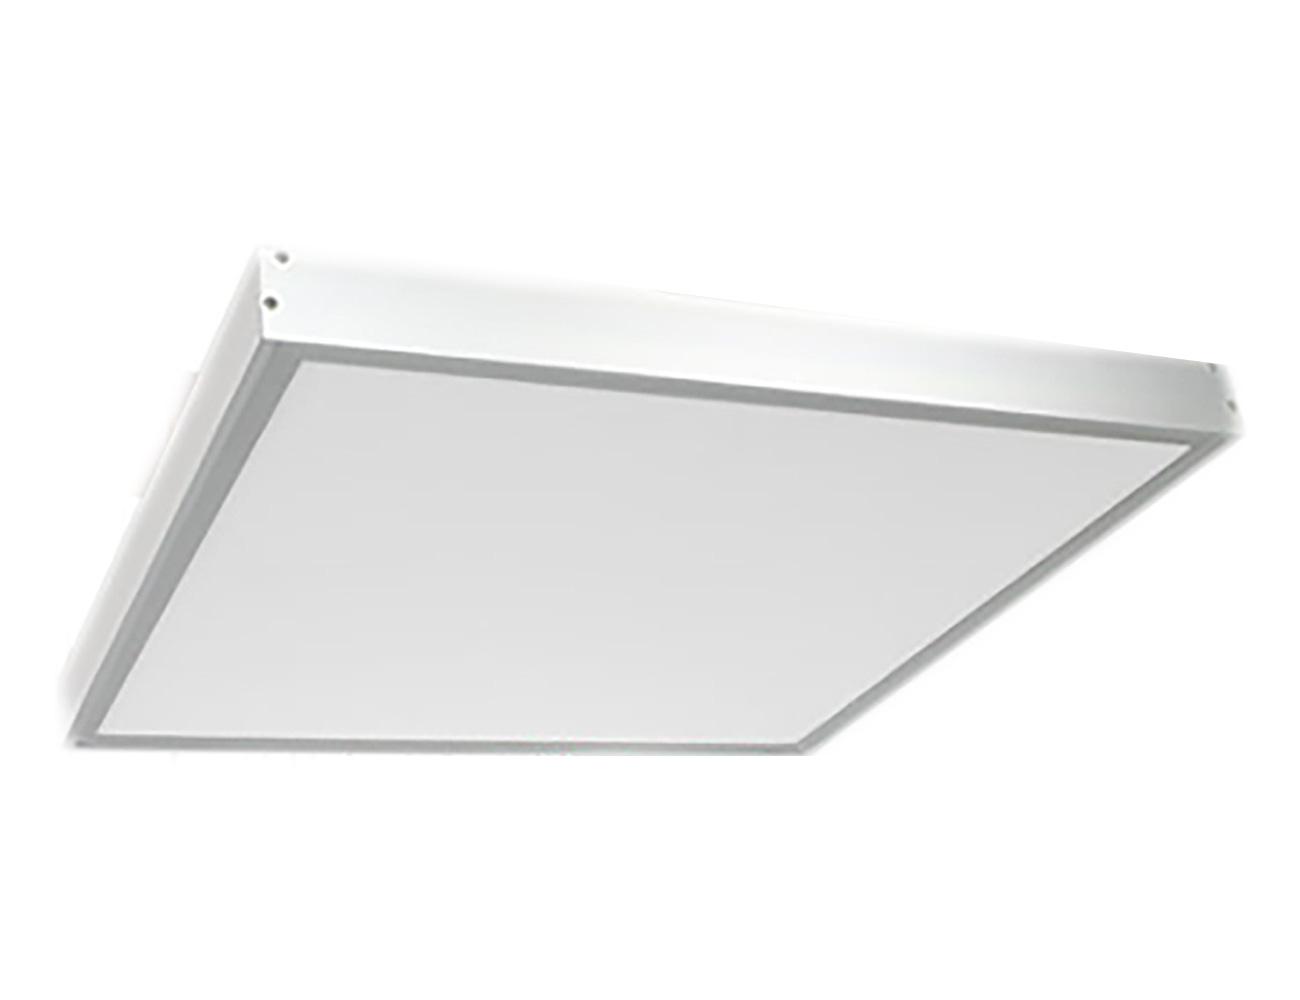 aufbaurahmen f r led panel ledtronic. Black Bedroom Furniture Sets. Home Design Ideas